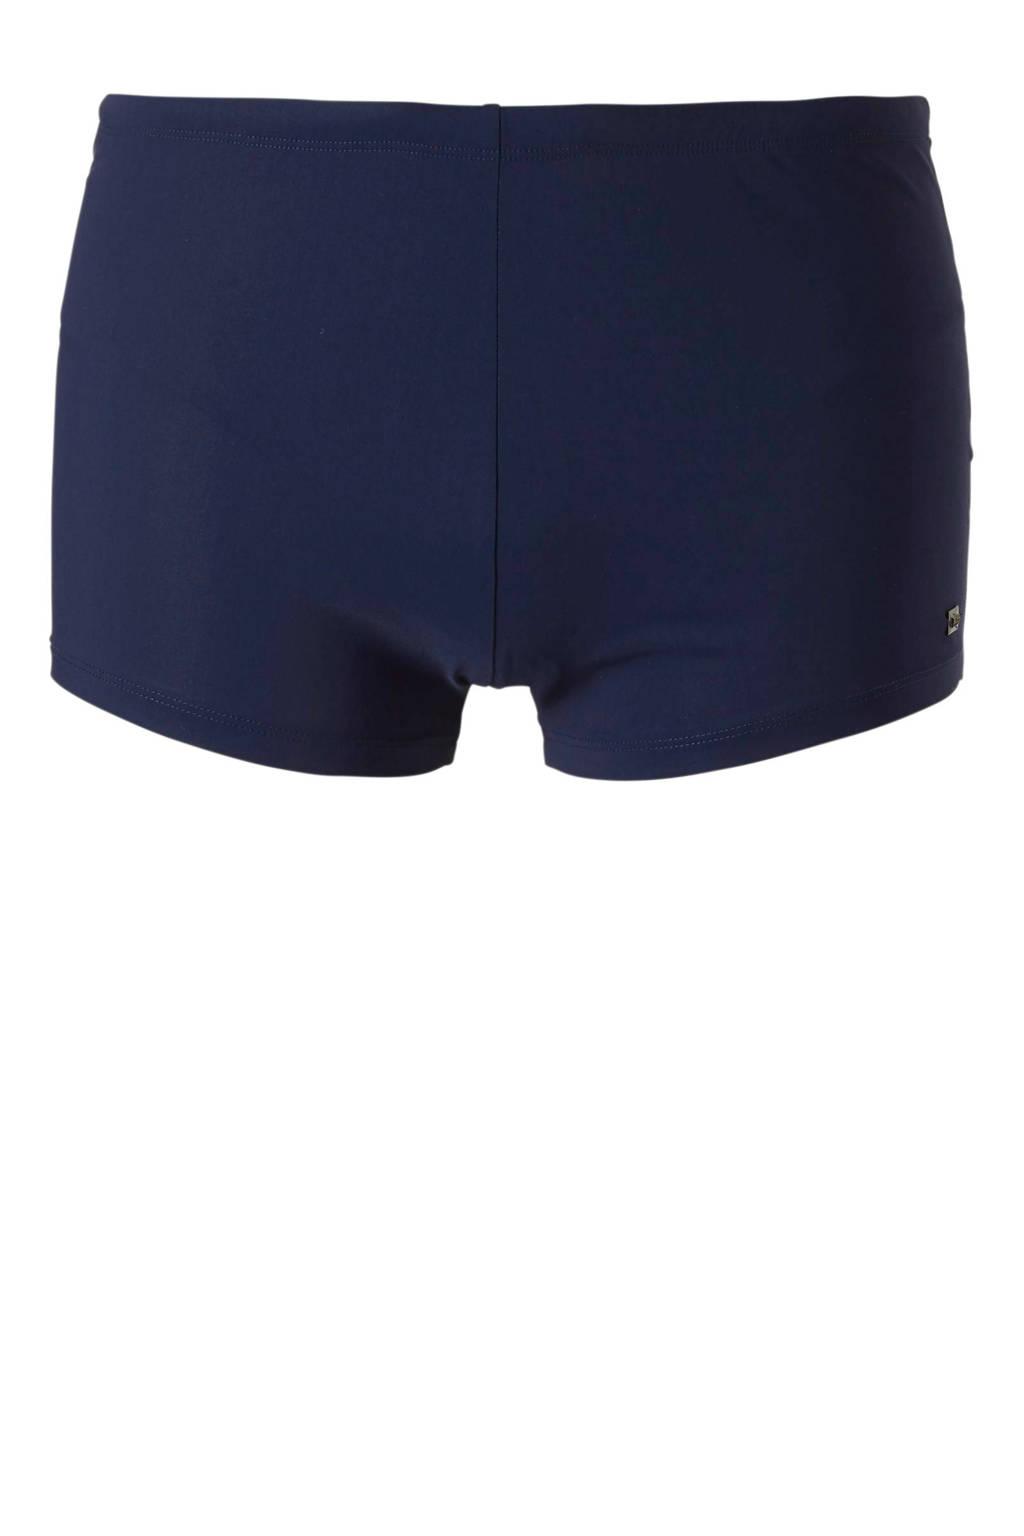 Boss zwemboxer Oyster donkerblauw, Donkerblauw